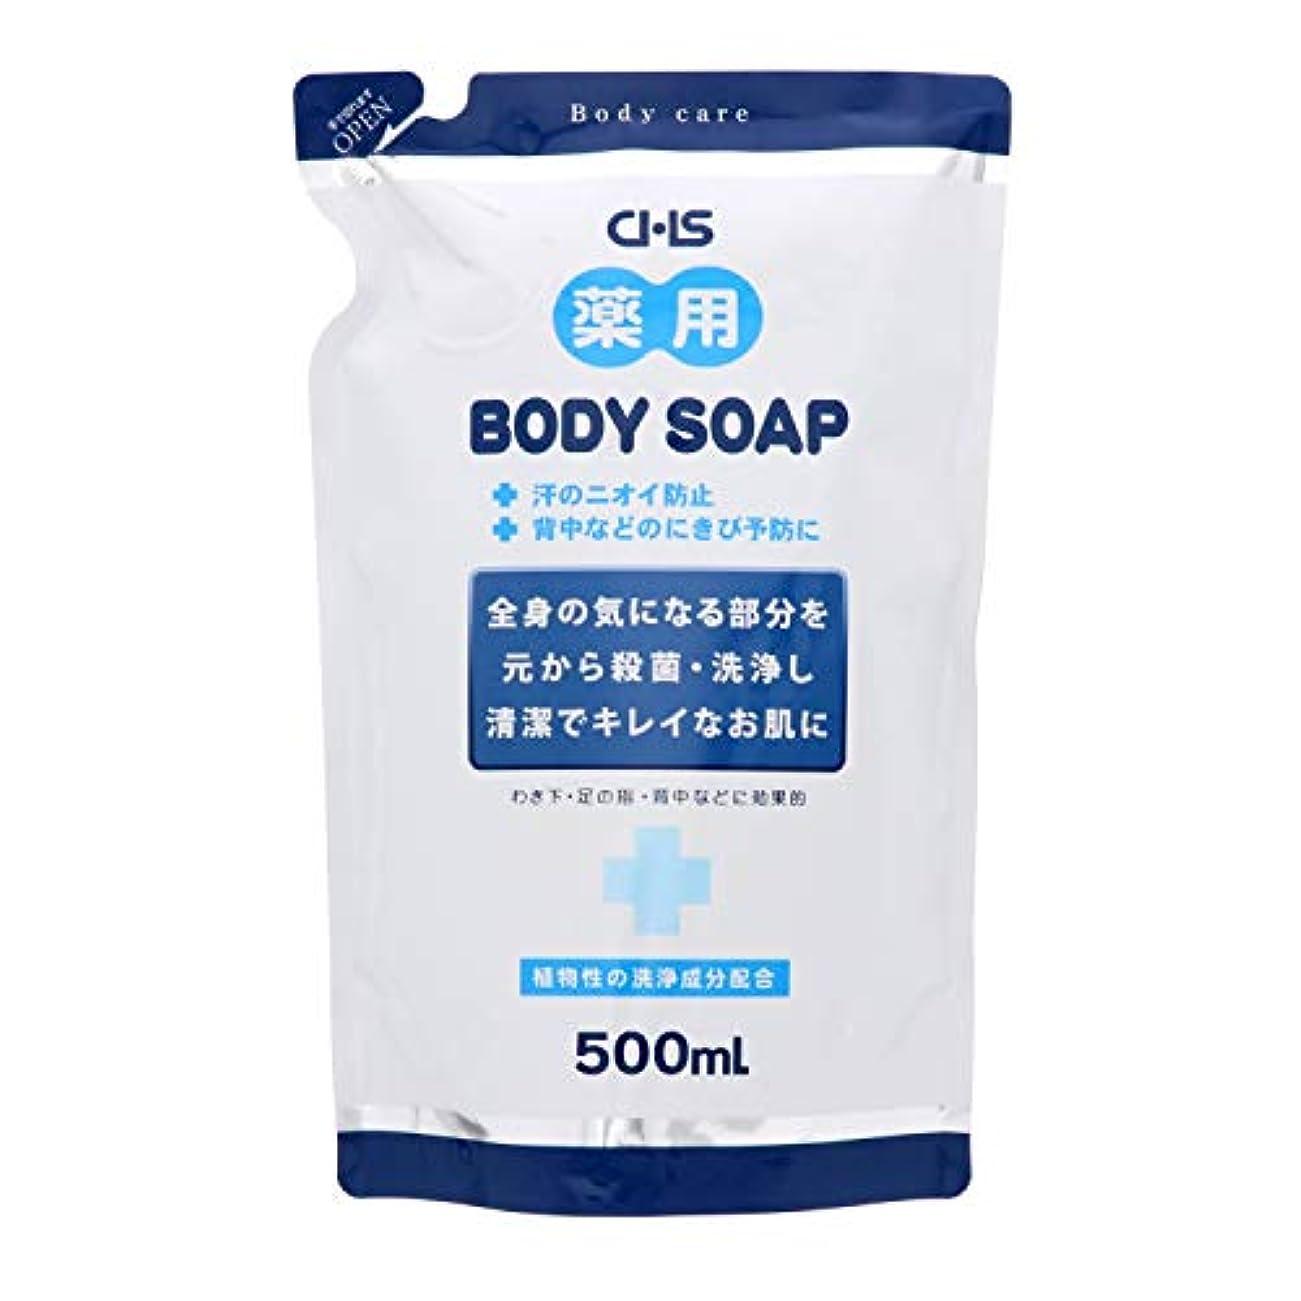 CHS 薬用ボディソープ 500ml